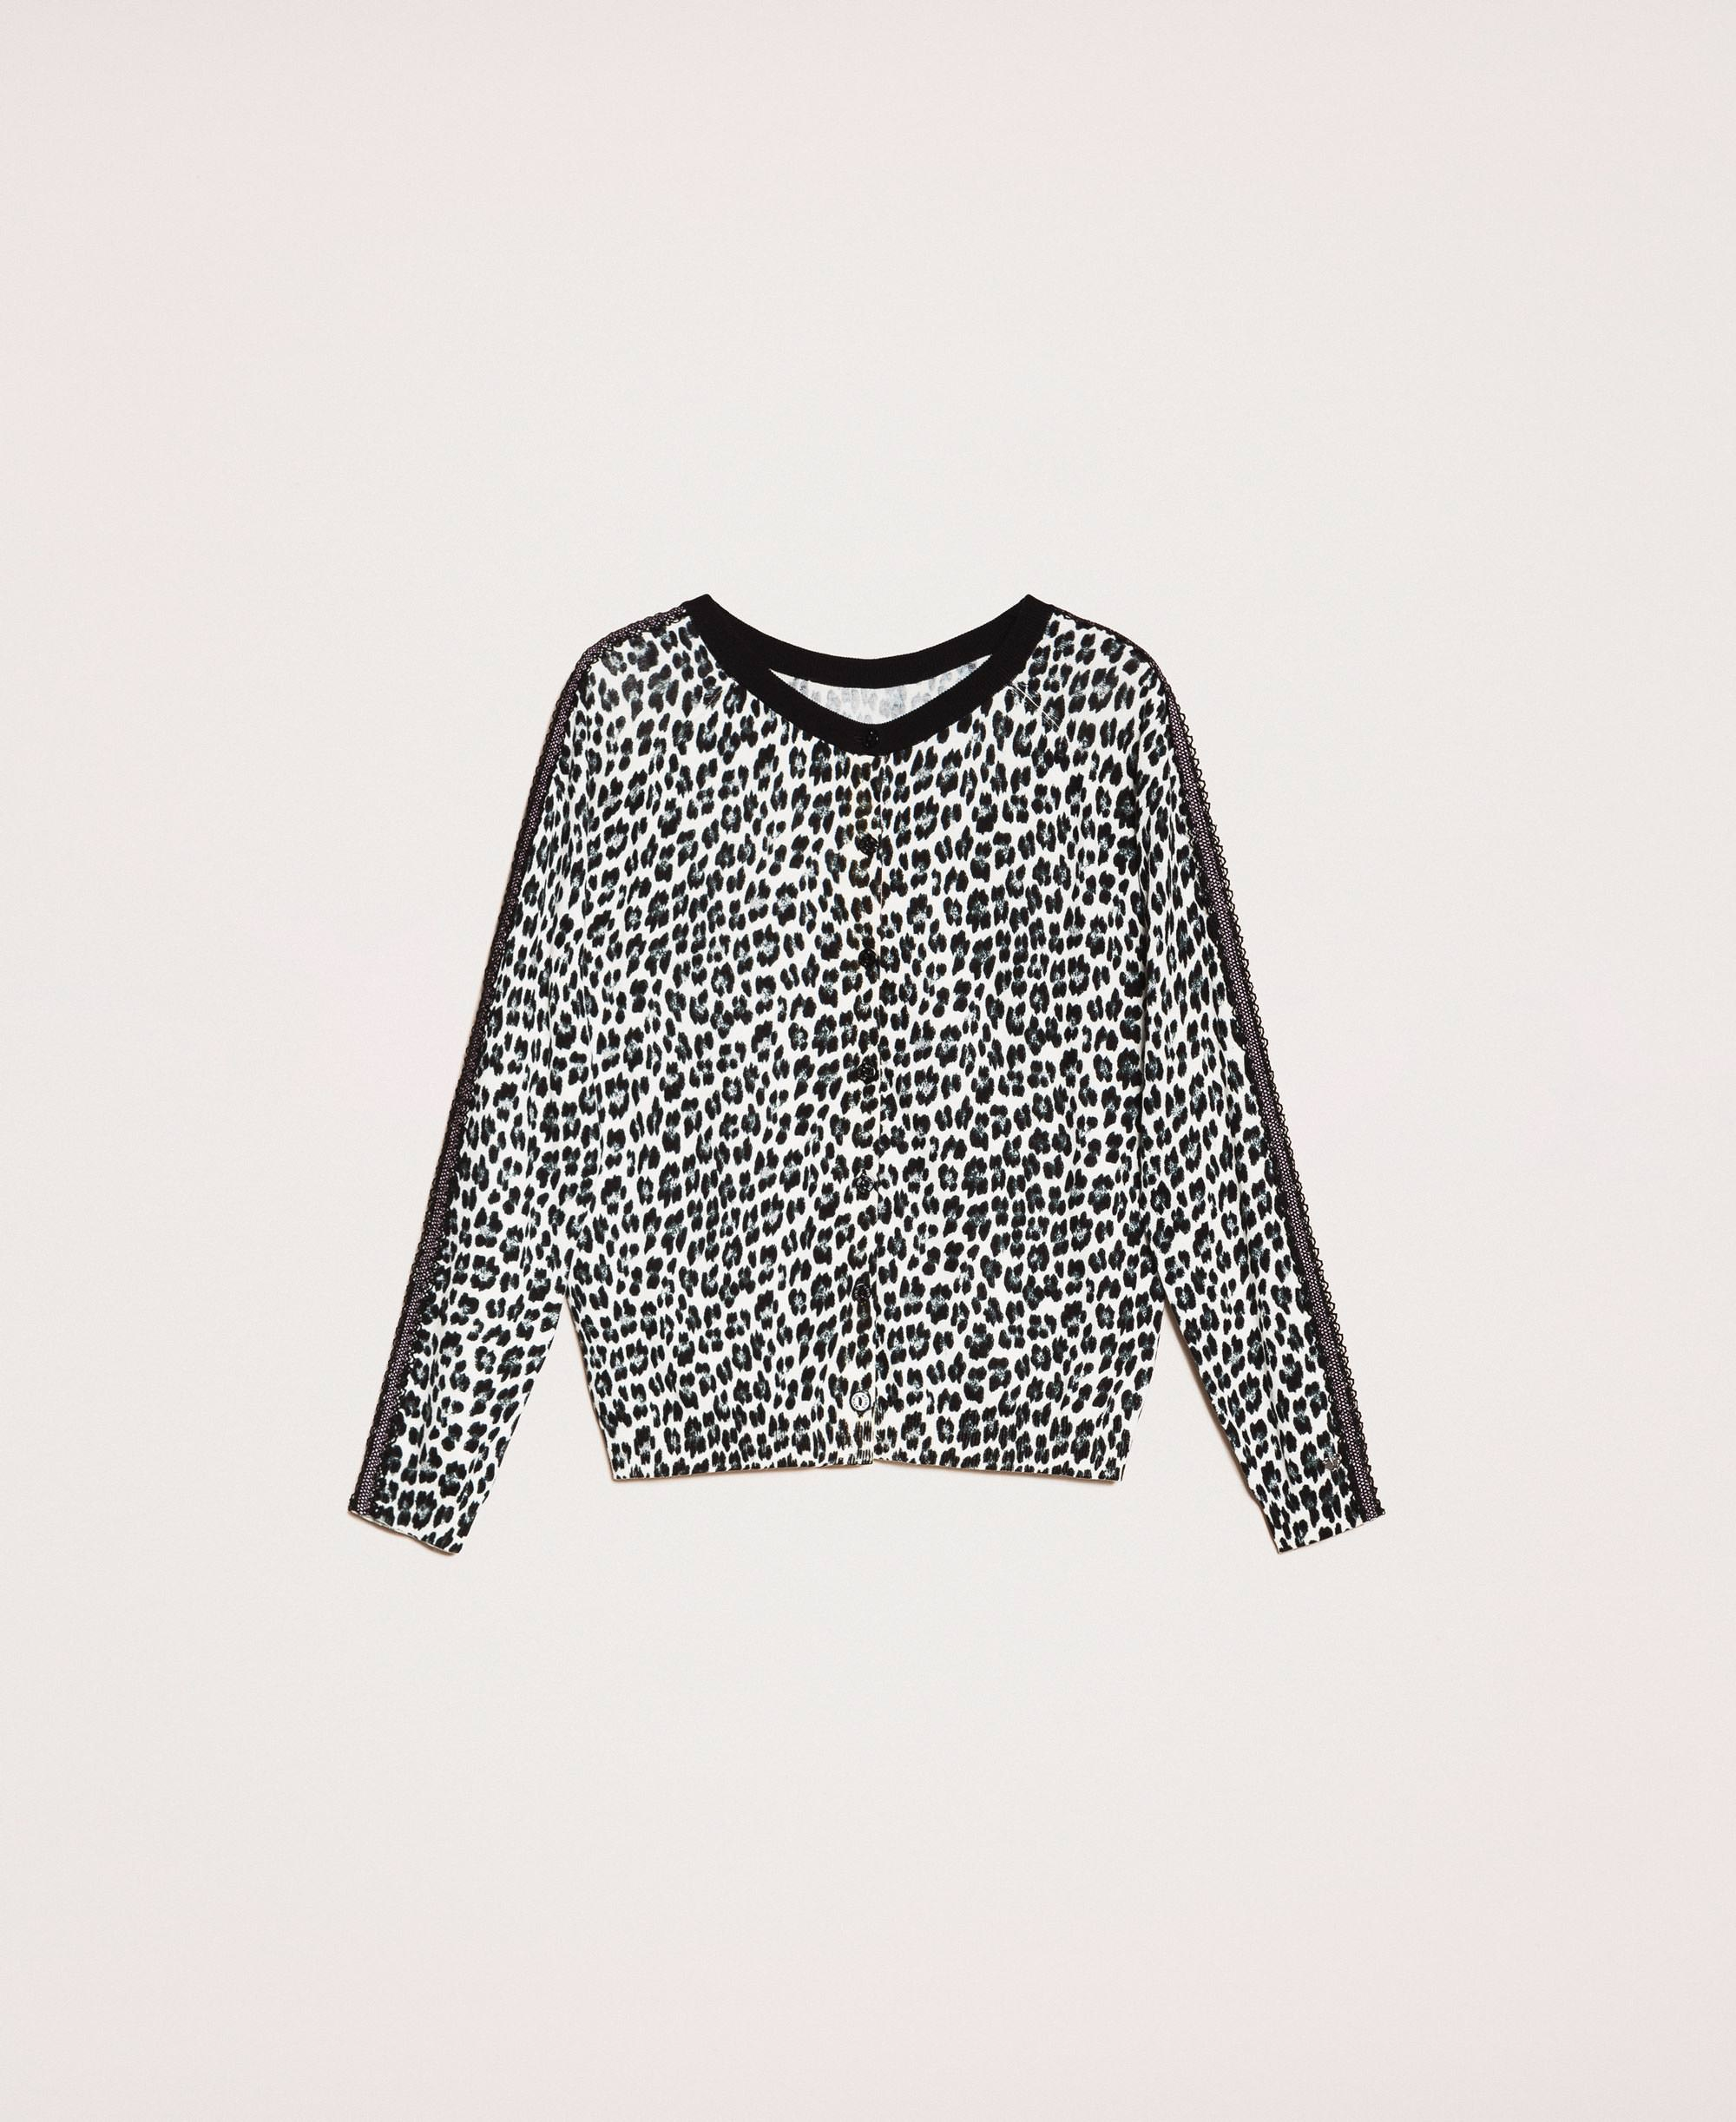 Animal print jumper cardigan Woman, Fantasy | TWINSET Milano